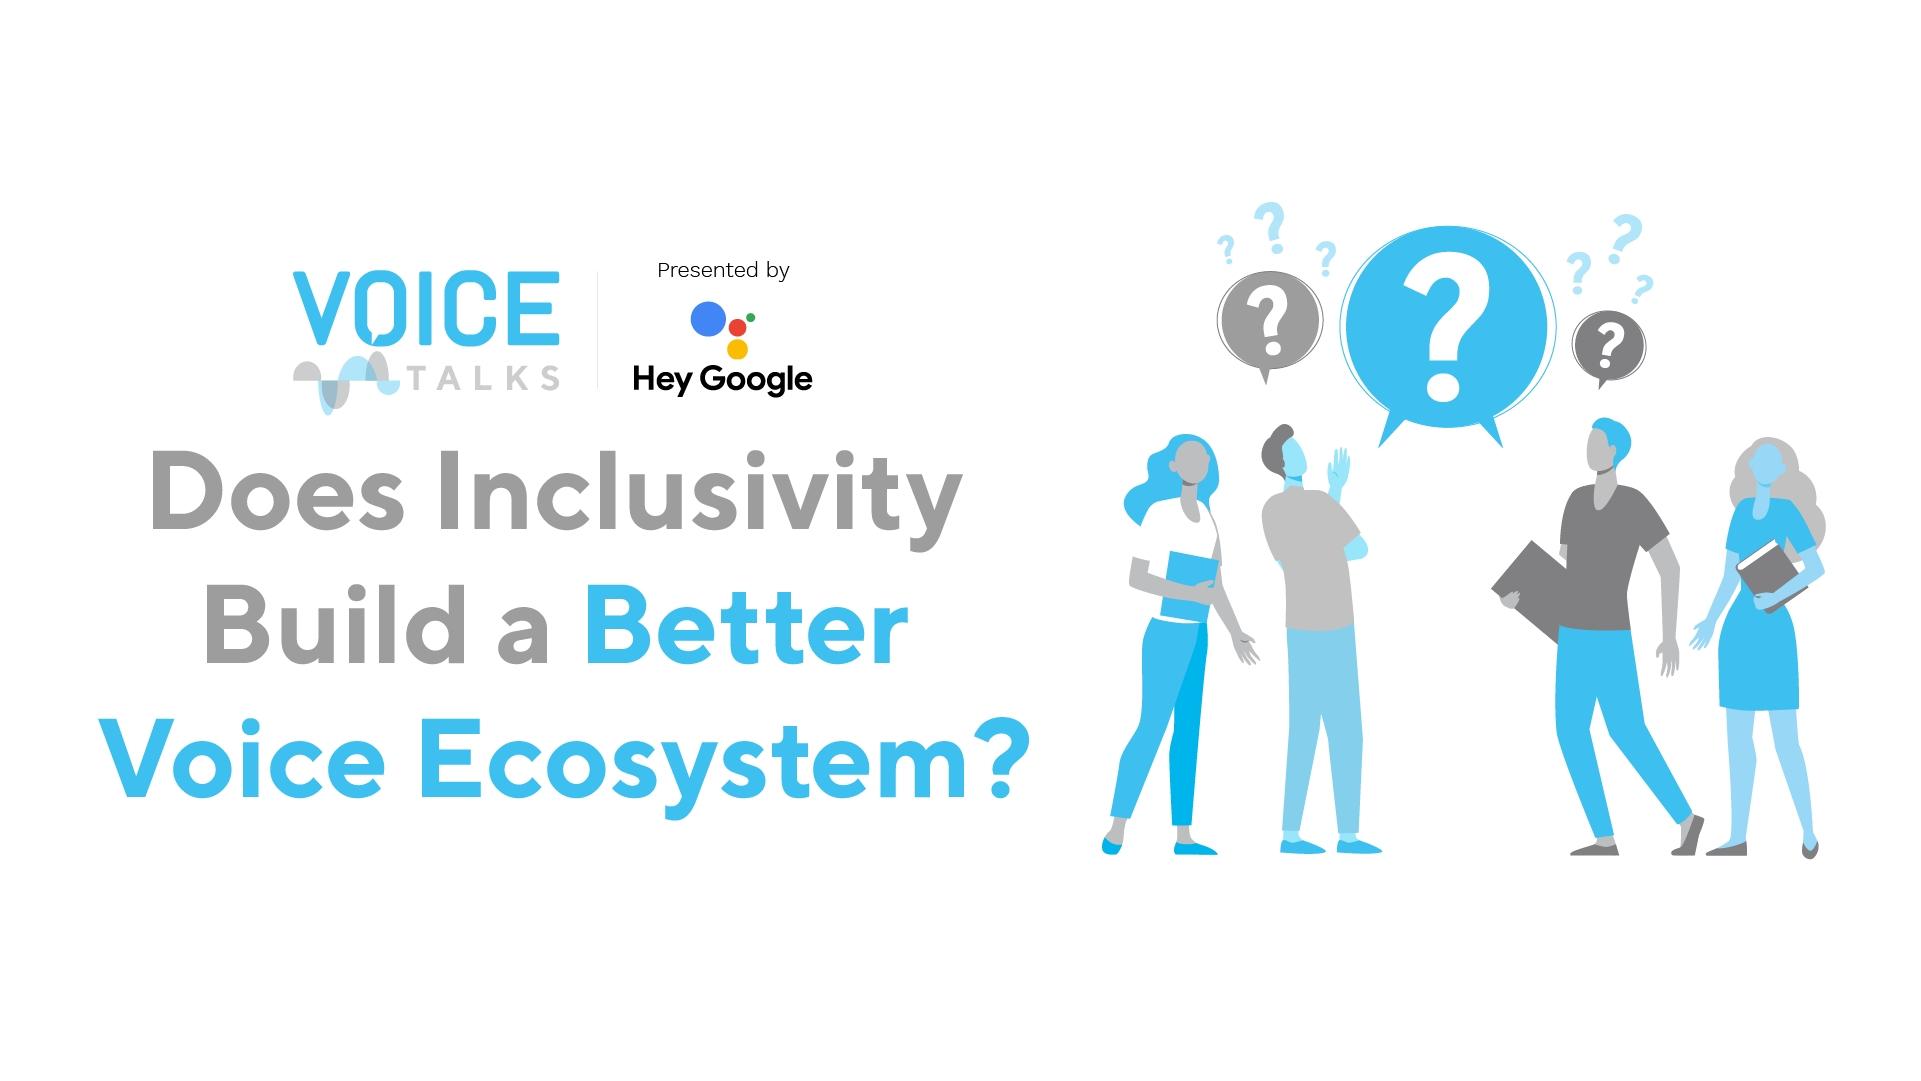 Does Inclusivity Build a Better Voice Ecosystem?